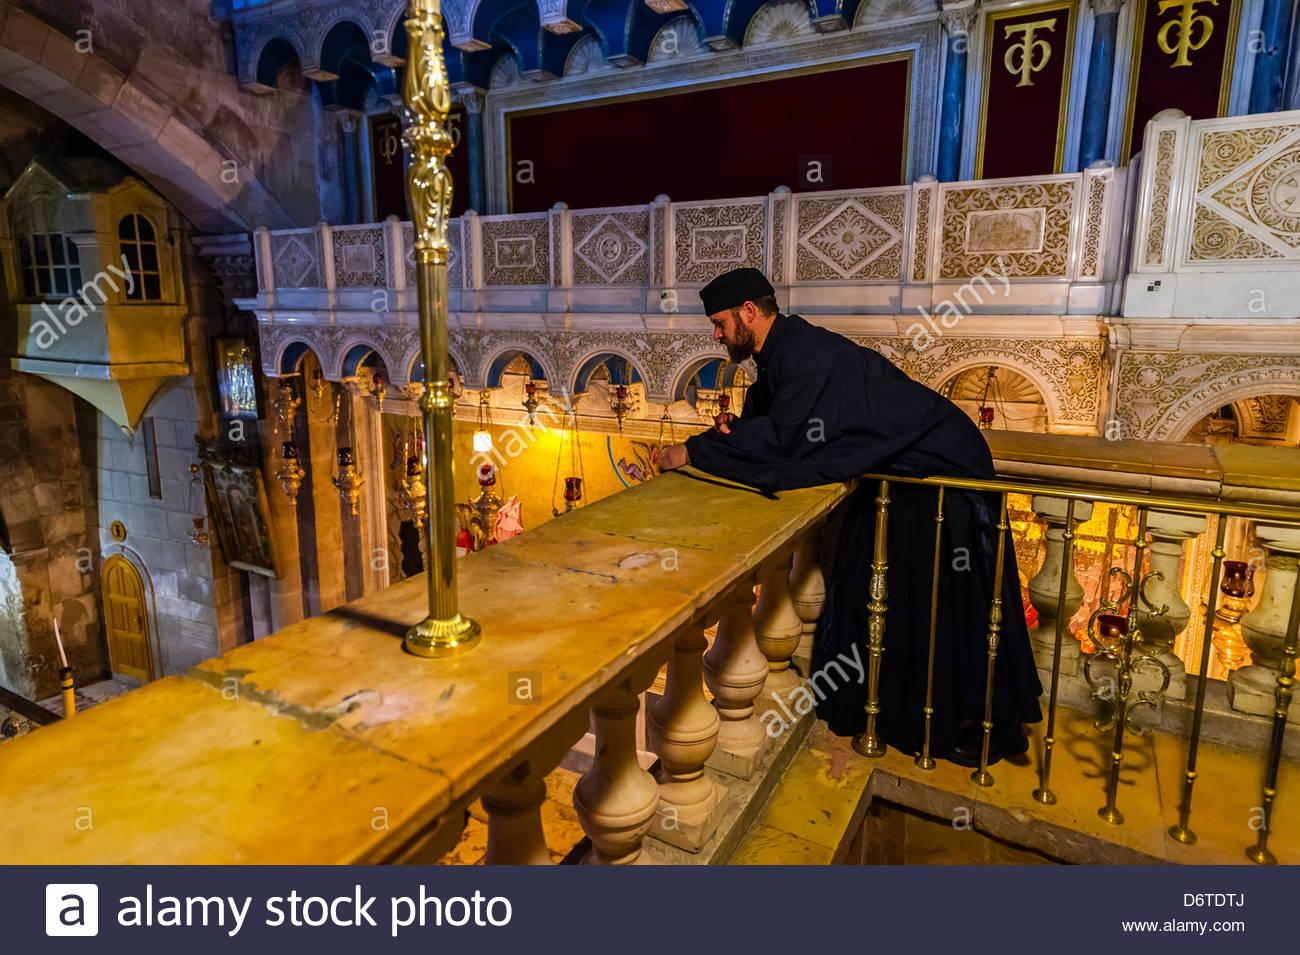 An Armenian Orthodox mass, Church of the Holy Sepulchre, he Christian Quarter, Old City, Jerusalem, Israel. - Stock Image